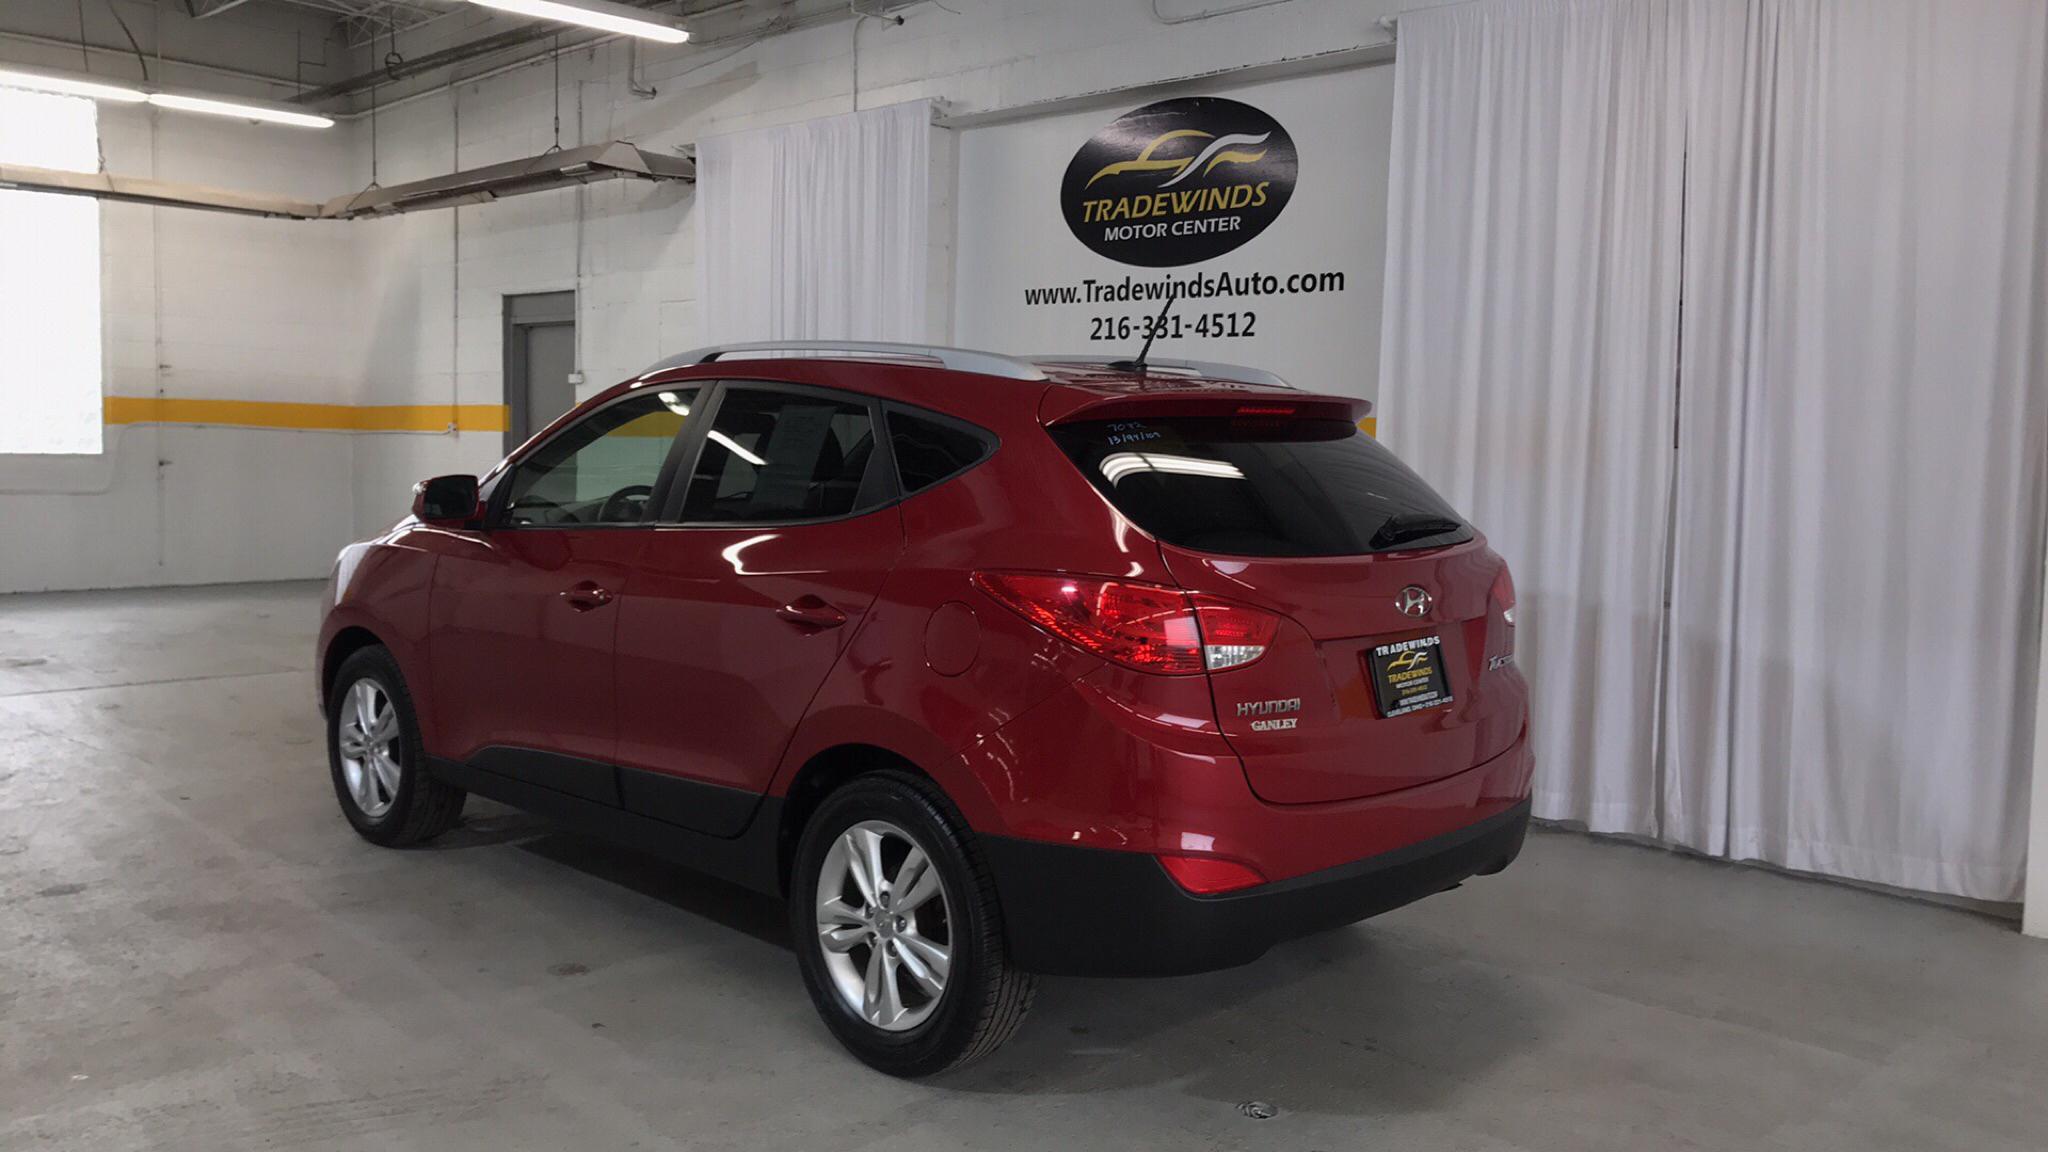 2013 HYUNDAI TUCSON GLS for sale at Tradewinds Motor Center